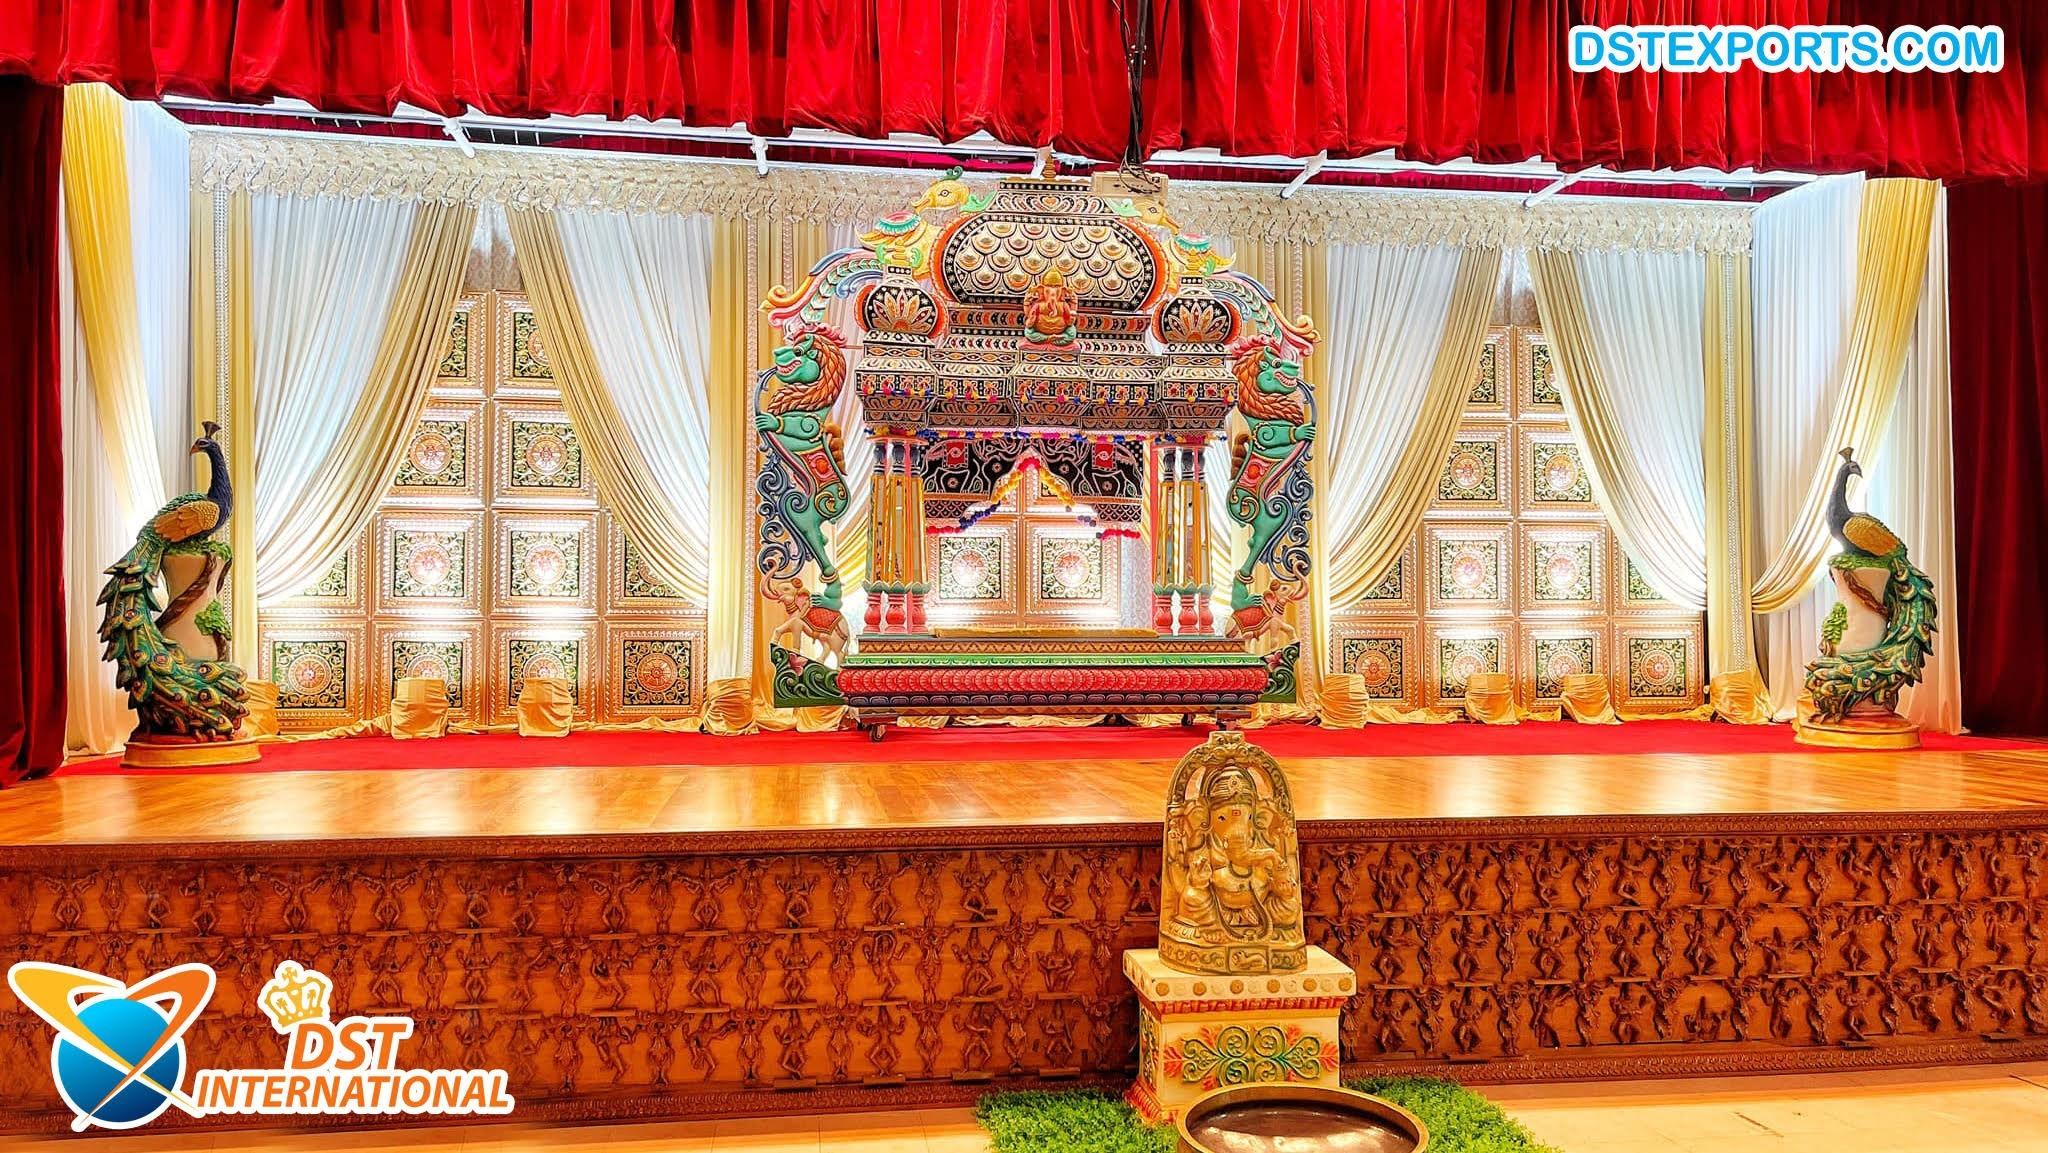 Manavari Theme South Indian Stage Decoration